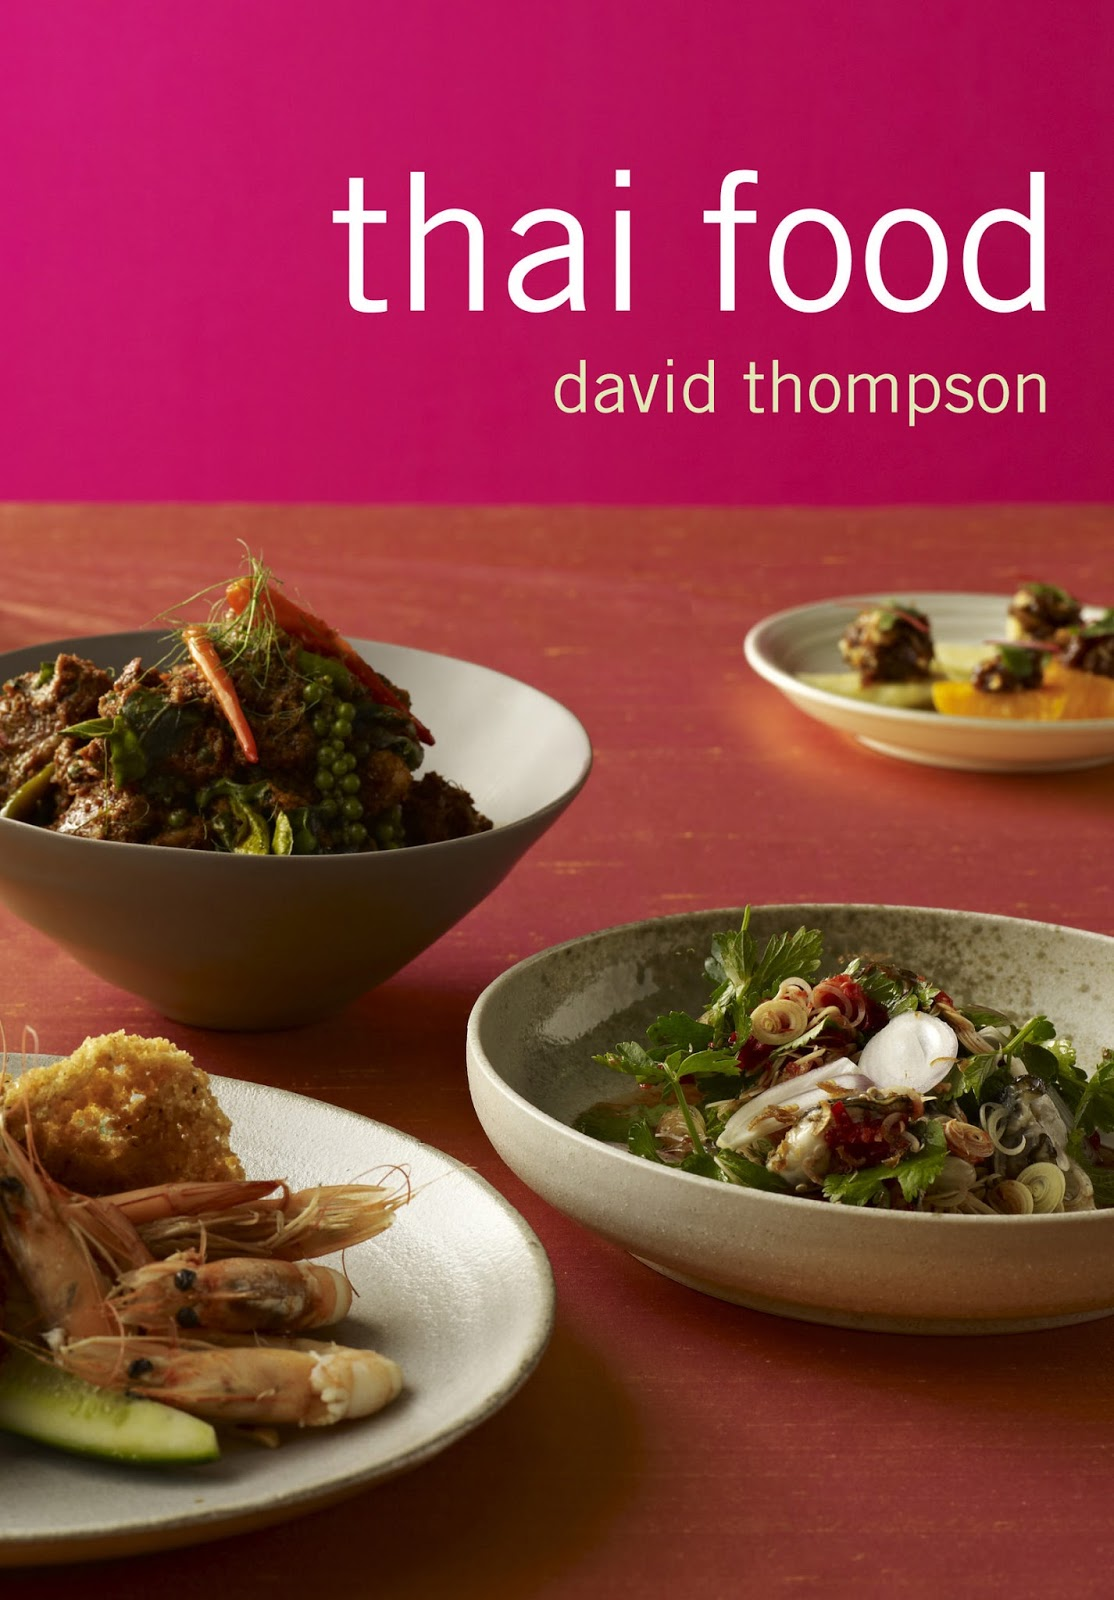 Amazon.com: Customer reviews: Thai Food